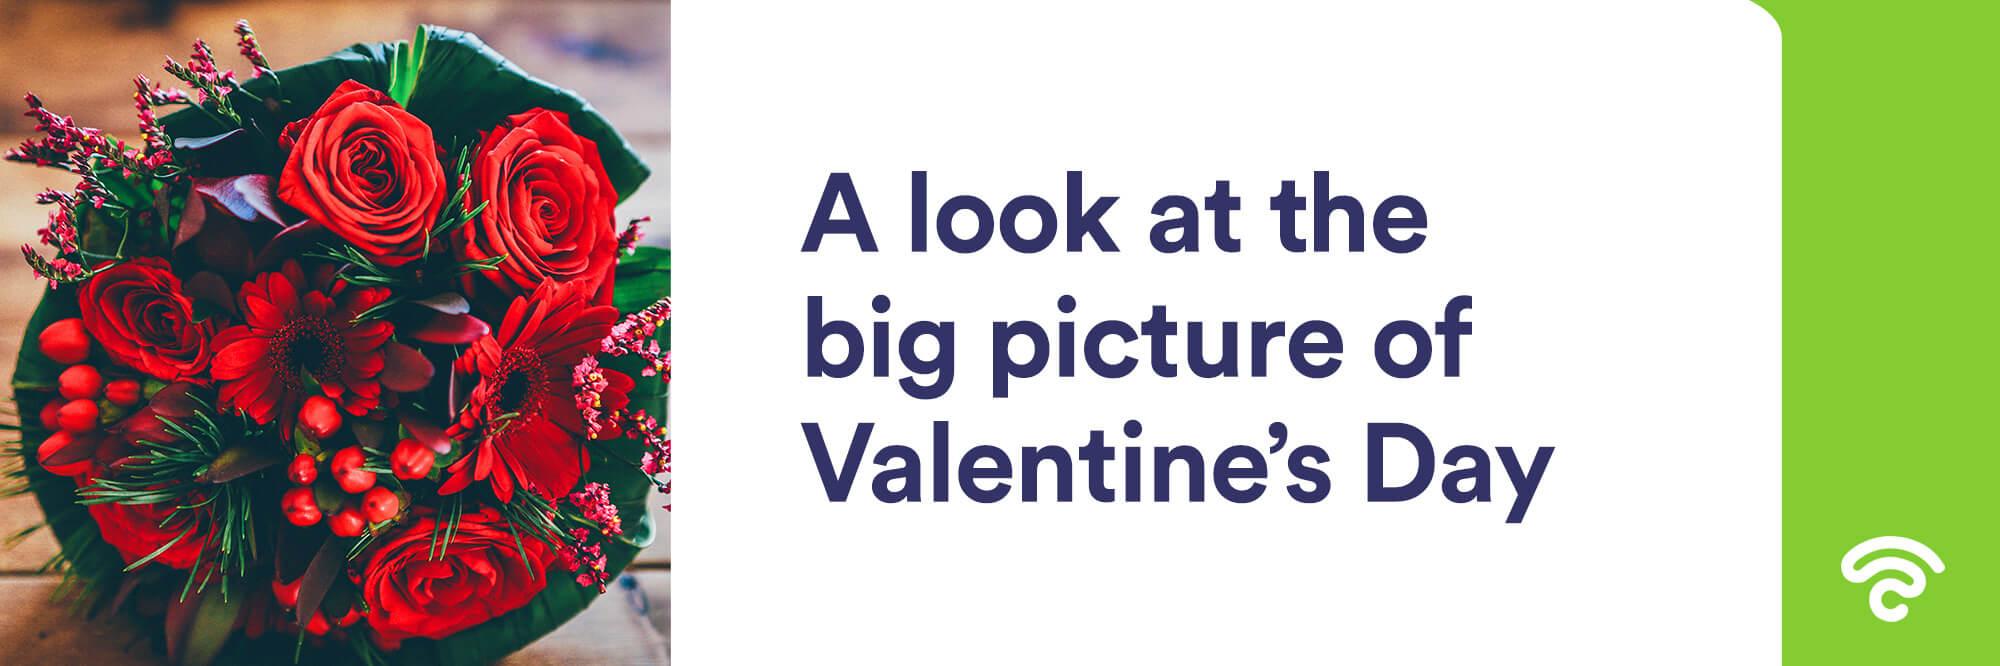 valentine's day big picture